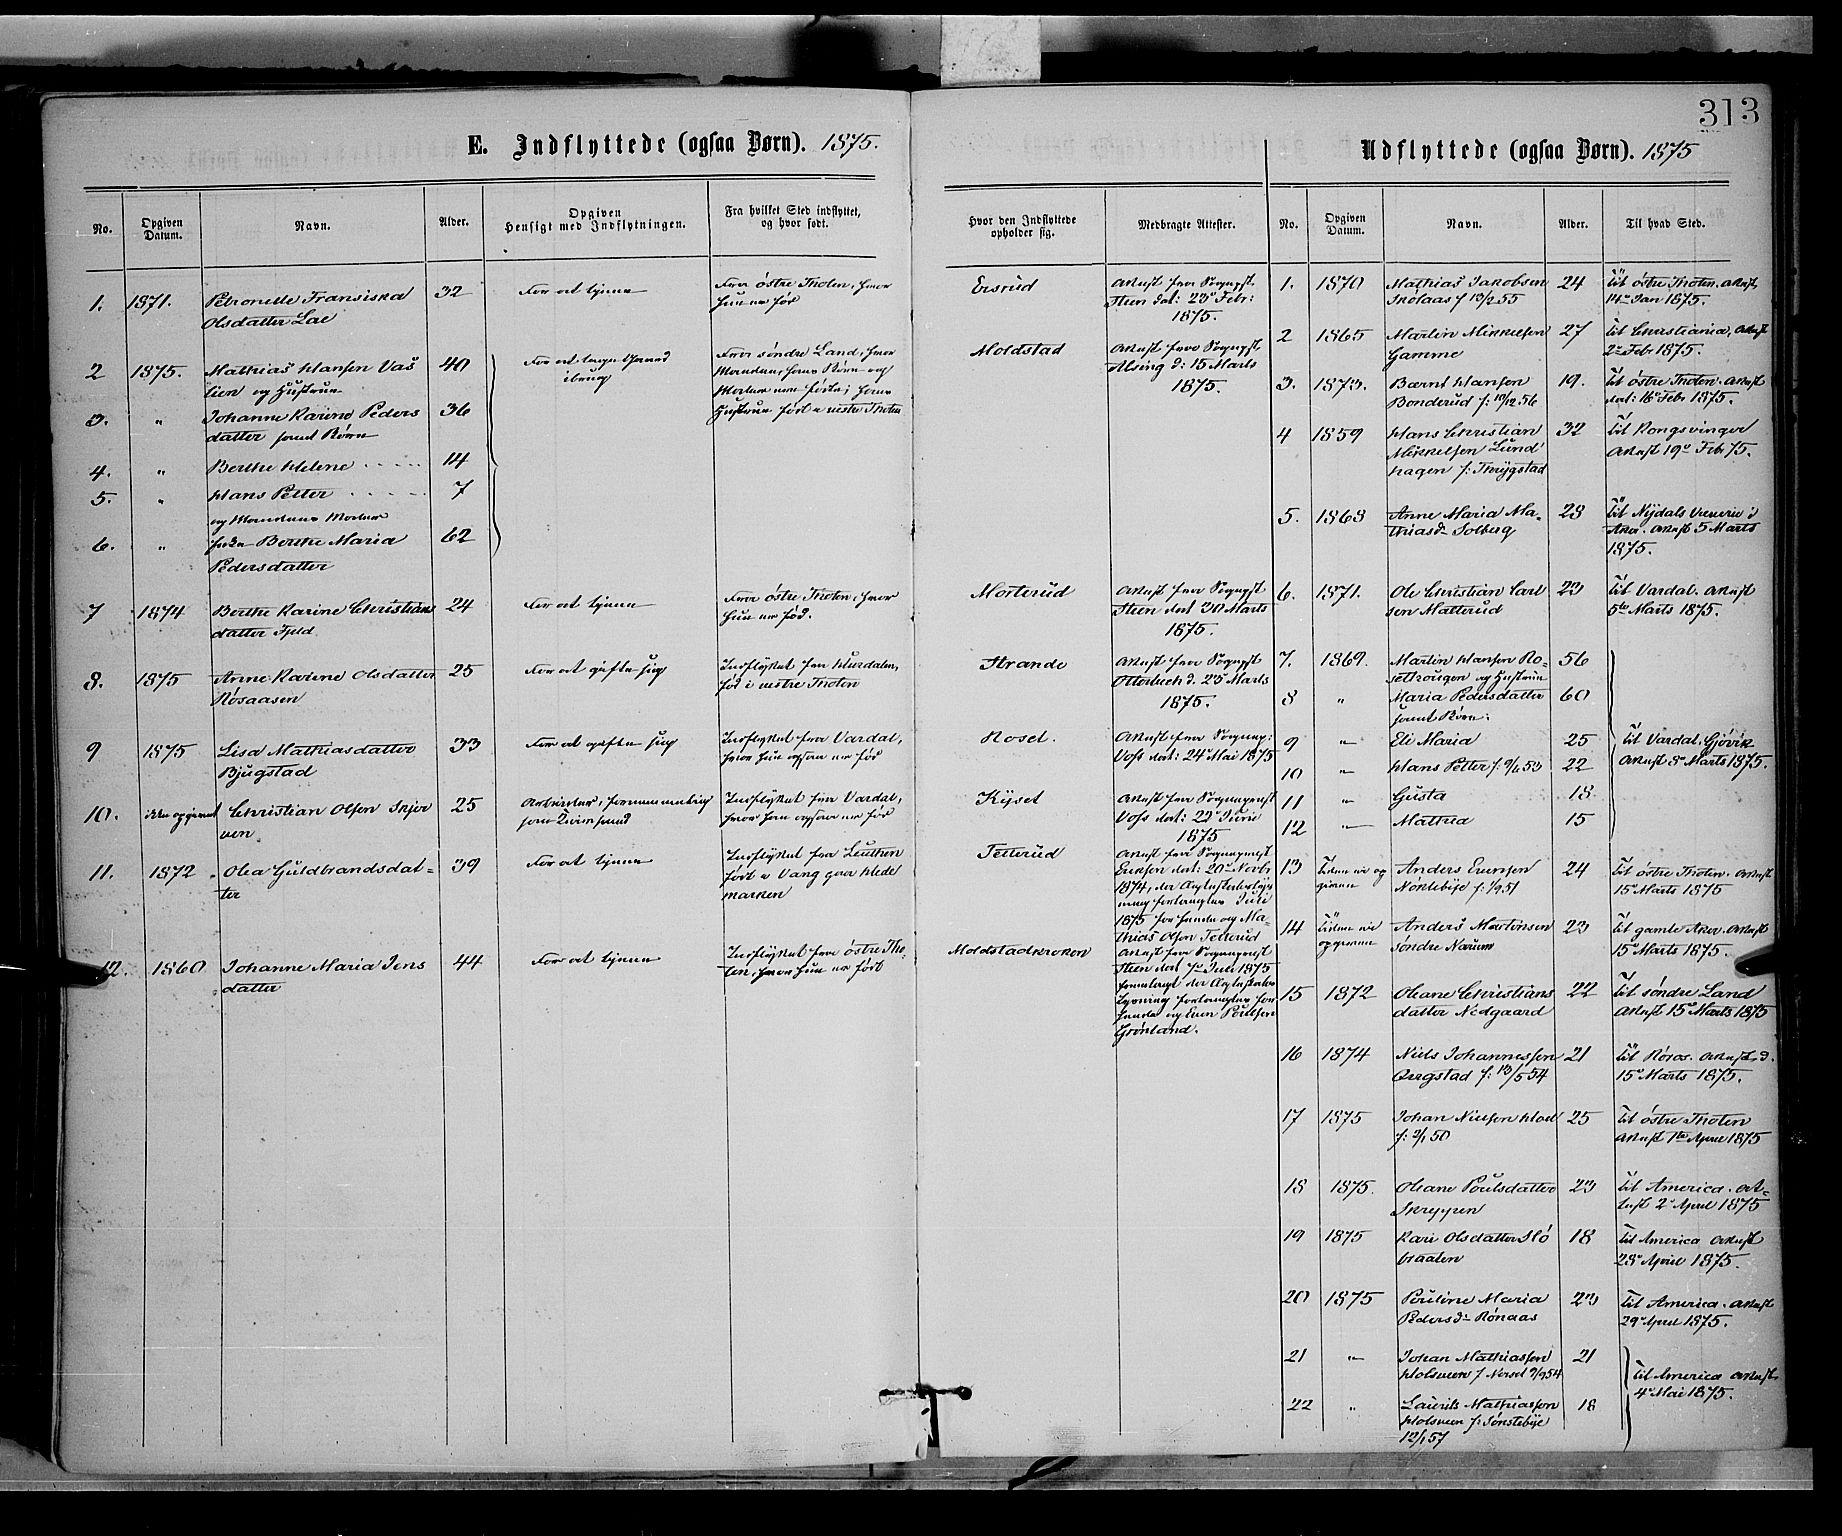 SAH, Vestre Toten prestekontor, H/Ha/Haa/L0008: Ministerialbok nr. 8, 1870-1877, s. 313